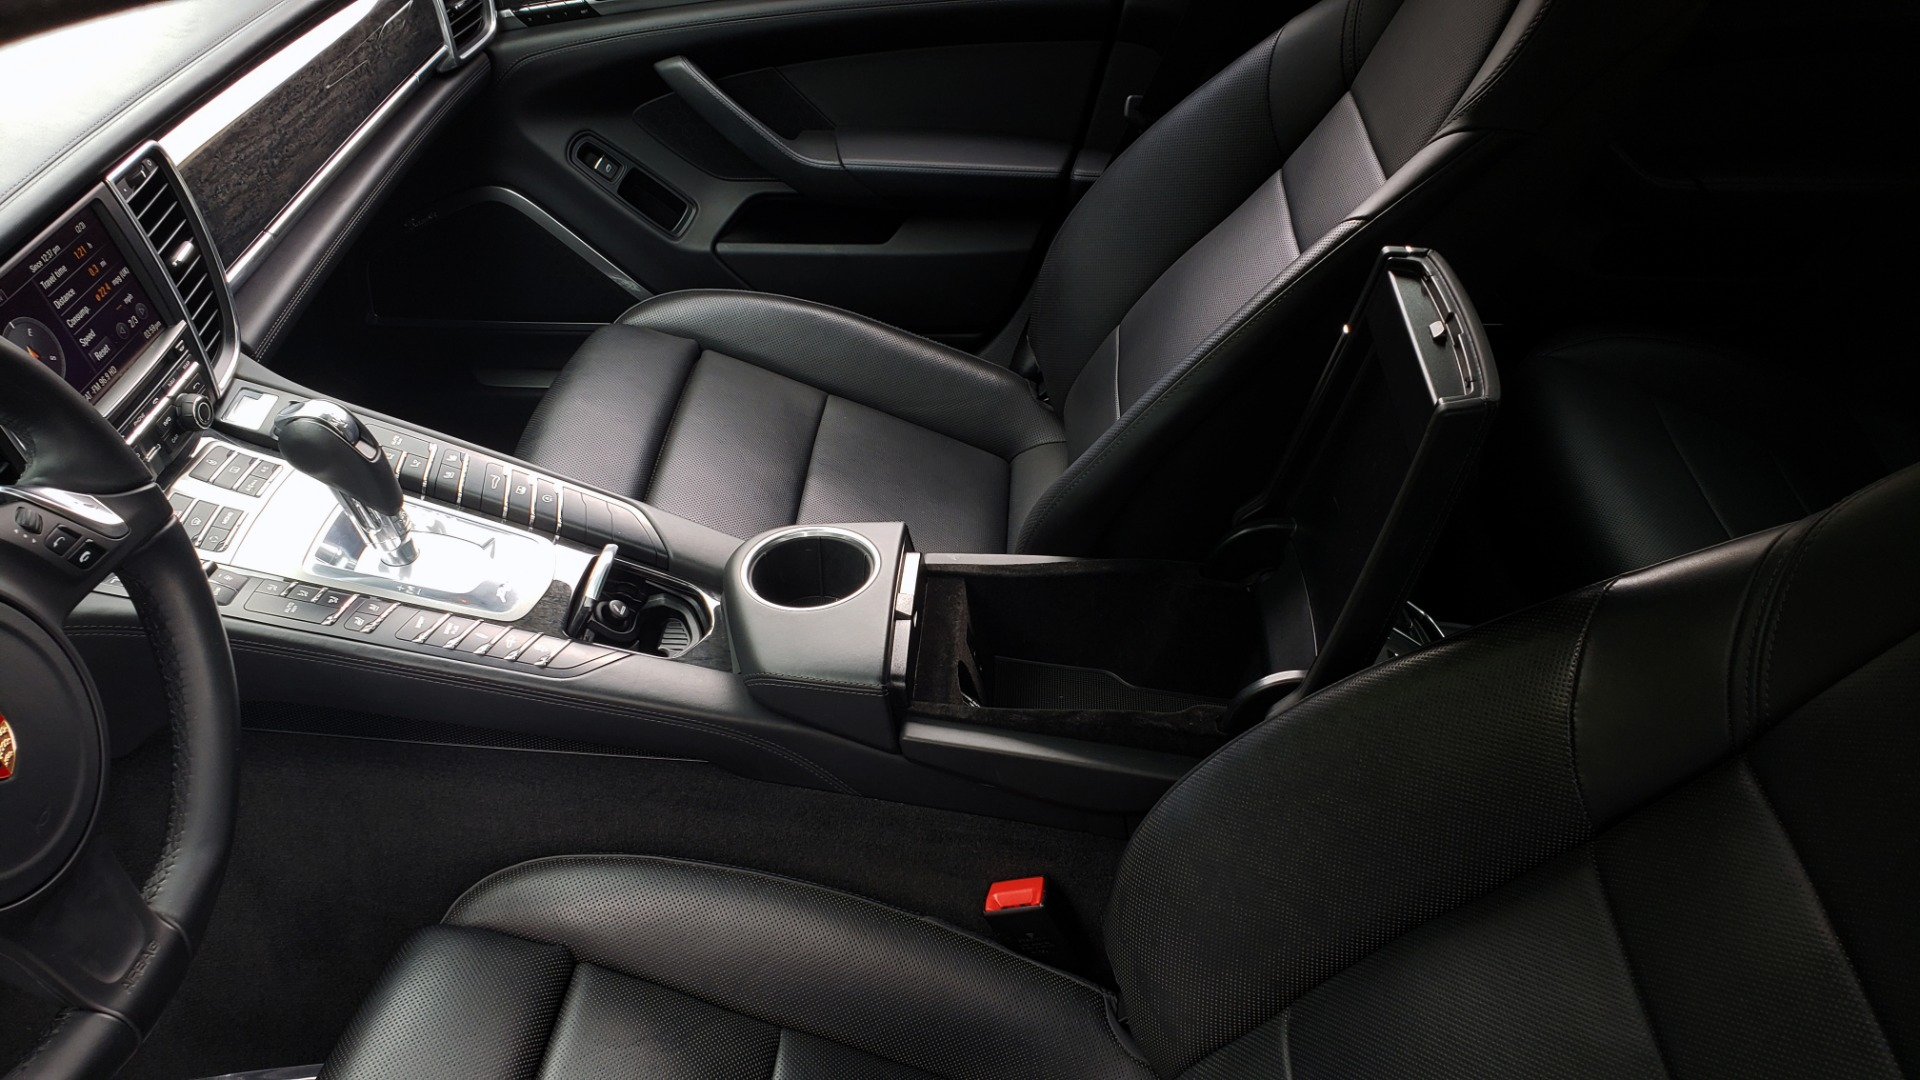 Used 2013 Porsche PANAMERA TURBO 4.8L V8 / AWD / NAV / SUNROOF / LCA / PARK ASST / BURMESTER for sale $45,995 at Formula Imports in Charlotte NC 28227 58